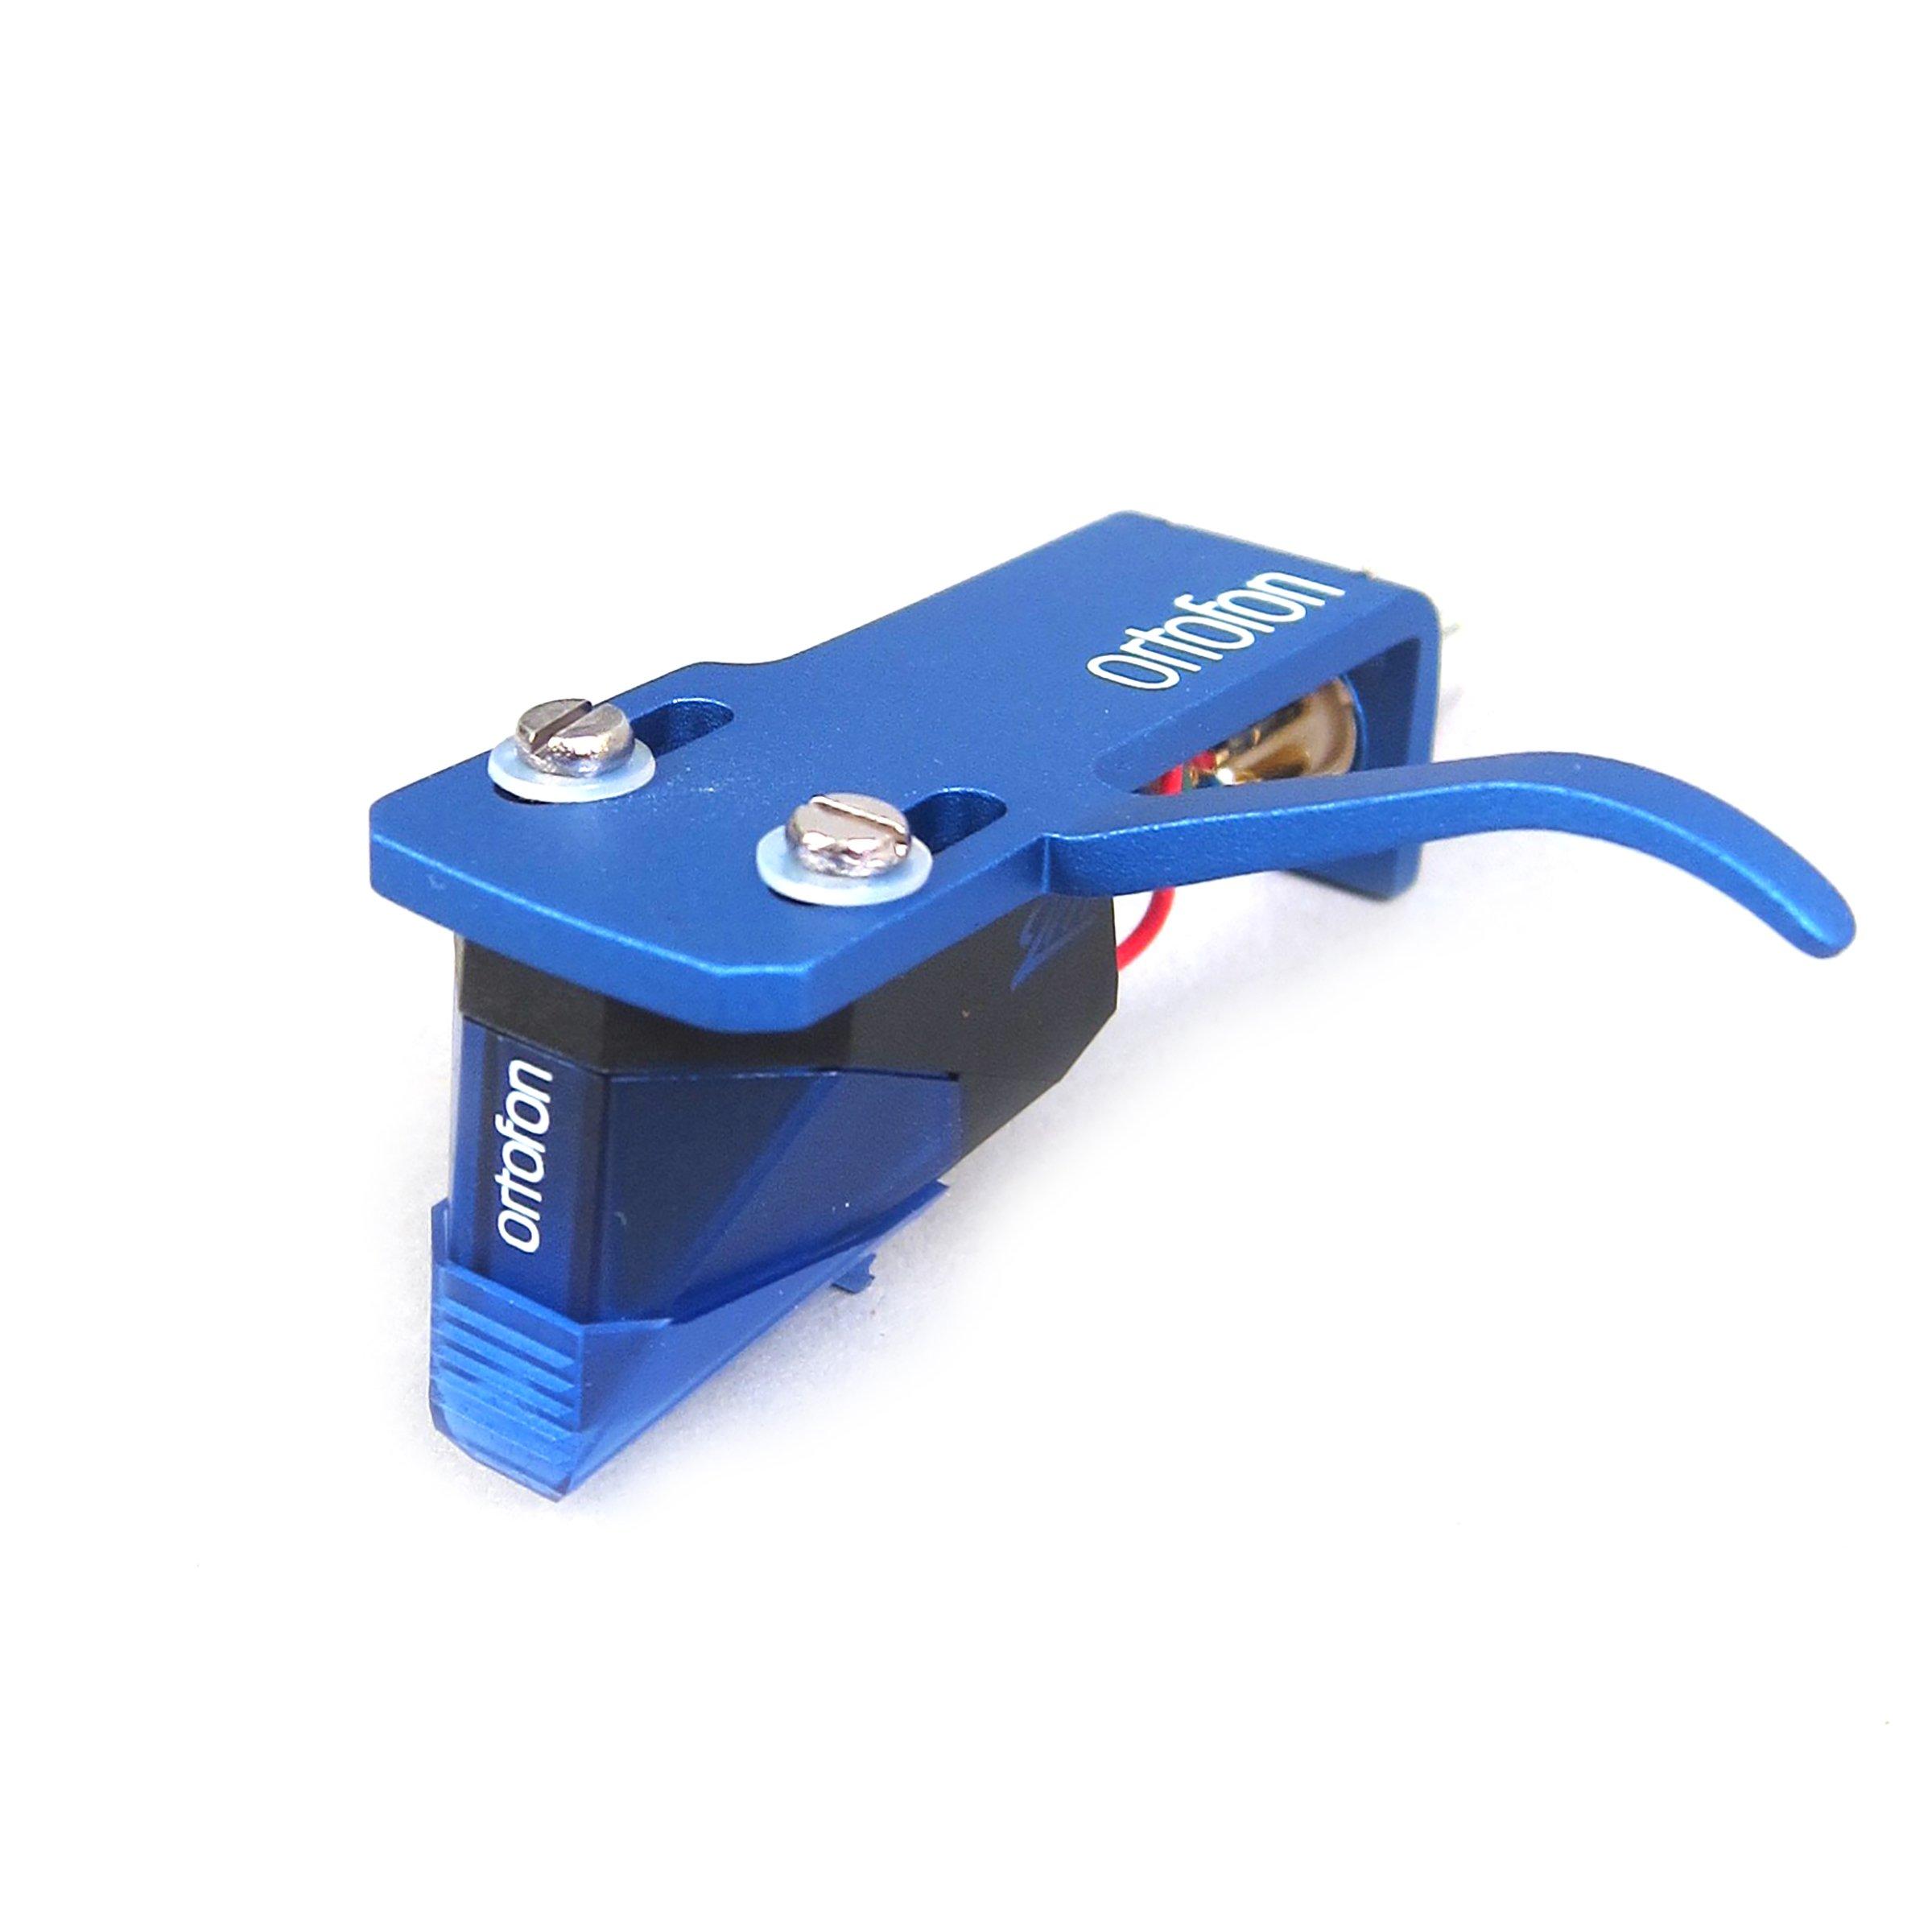 Capsula Ortofon: 2M Azul mas cabezal SH-4